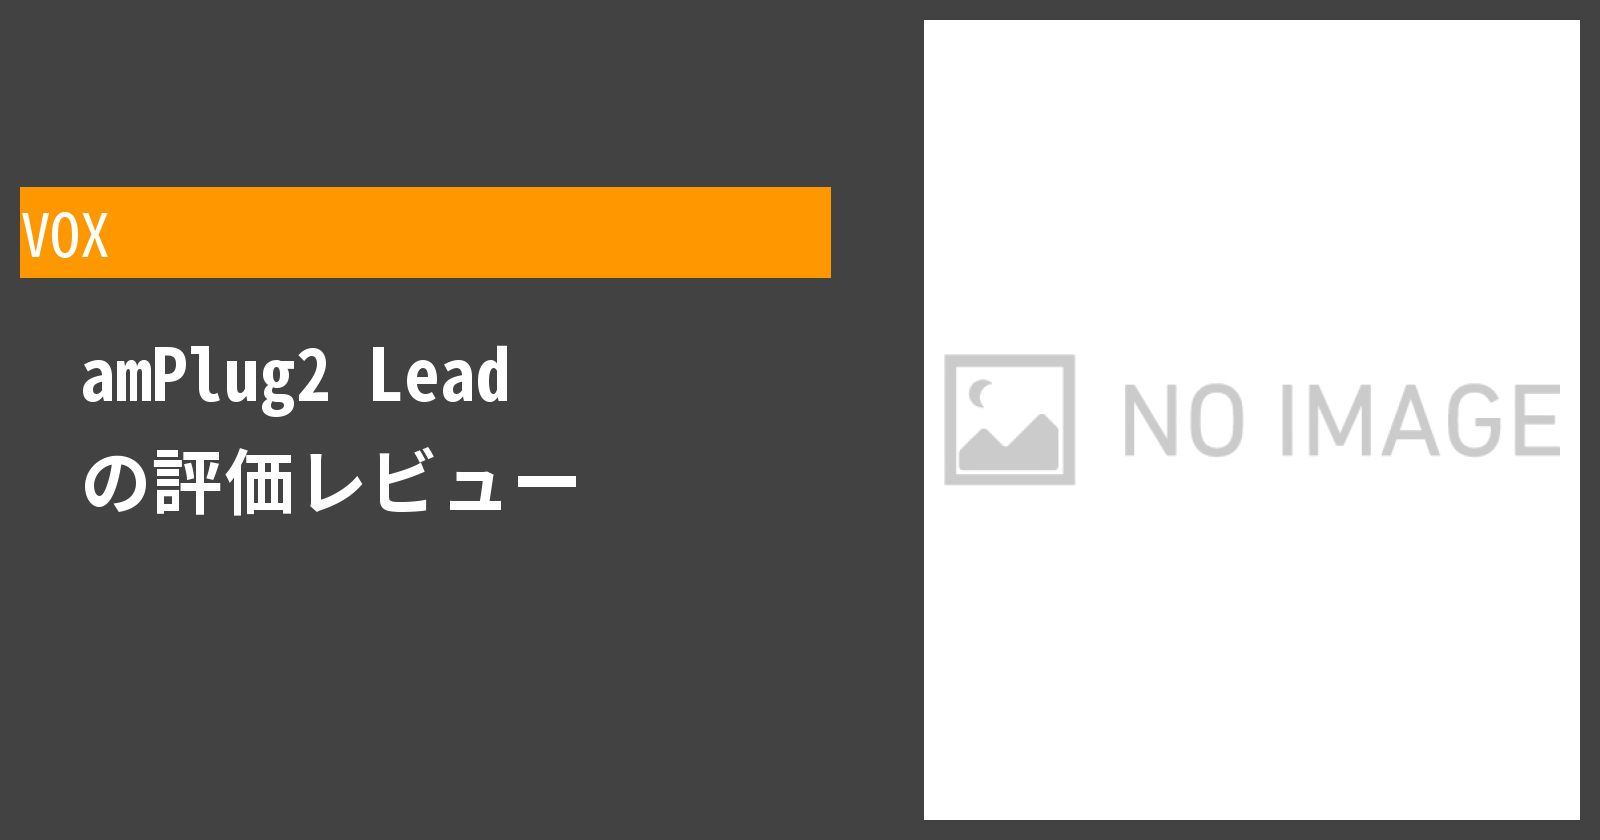 amPlug2 Leadを徹底評価